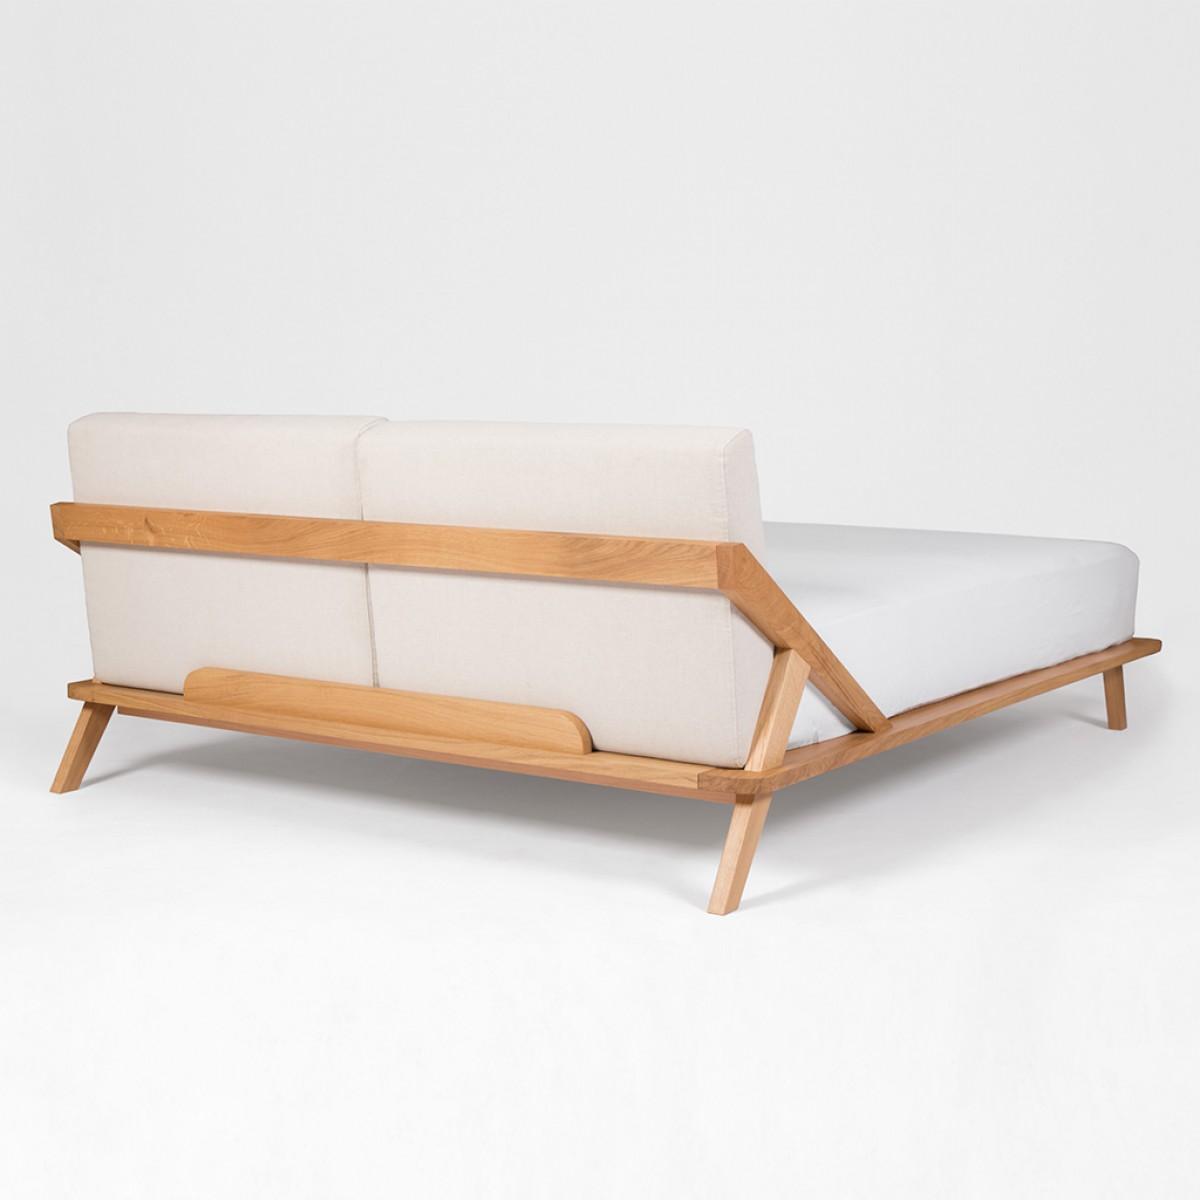 ellenberger Nordic Space Bett (160cm)